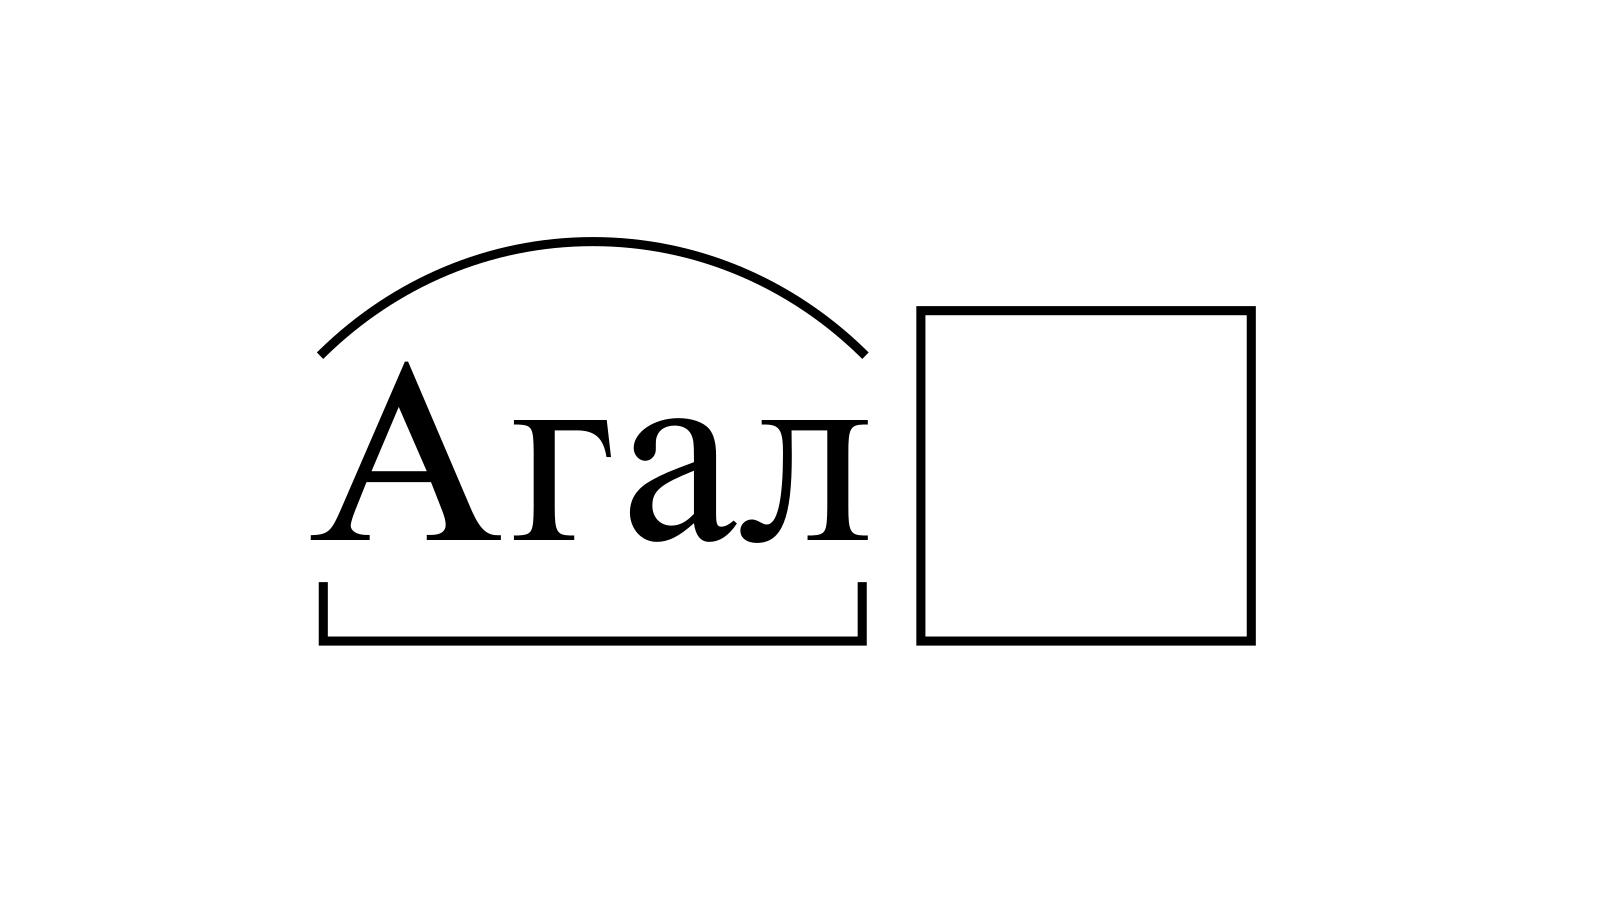 Разбор слова «Агал» по составу